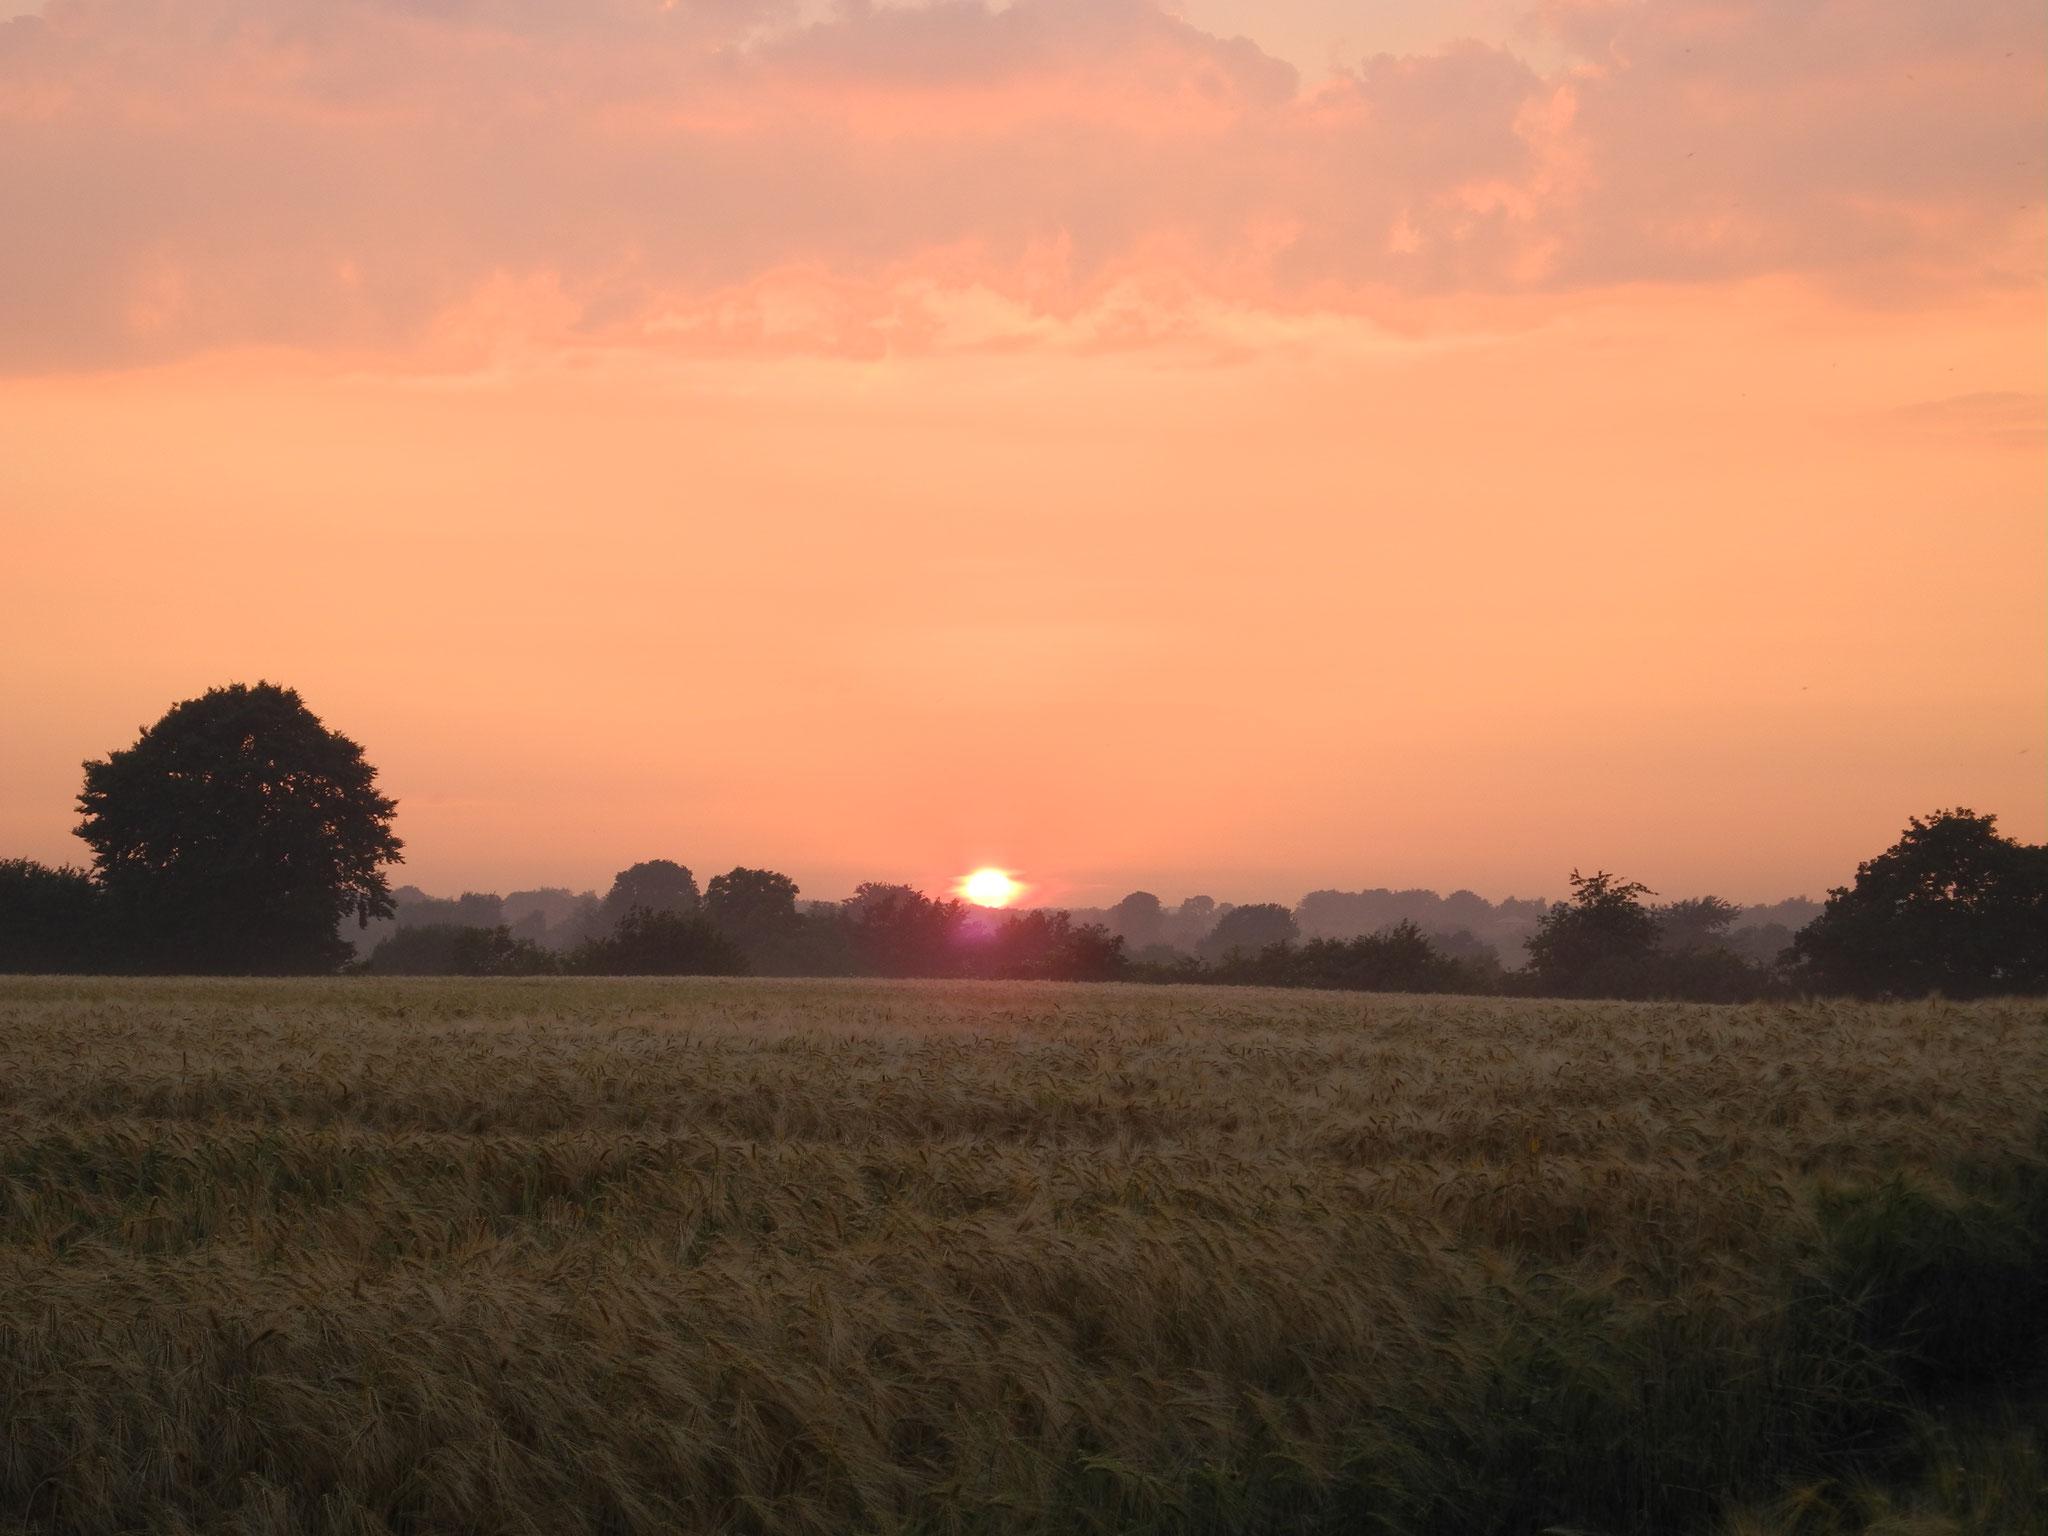 Sonnenuntergang in Ruhnmark